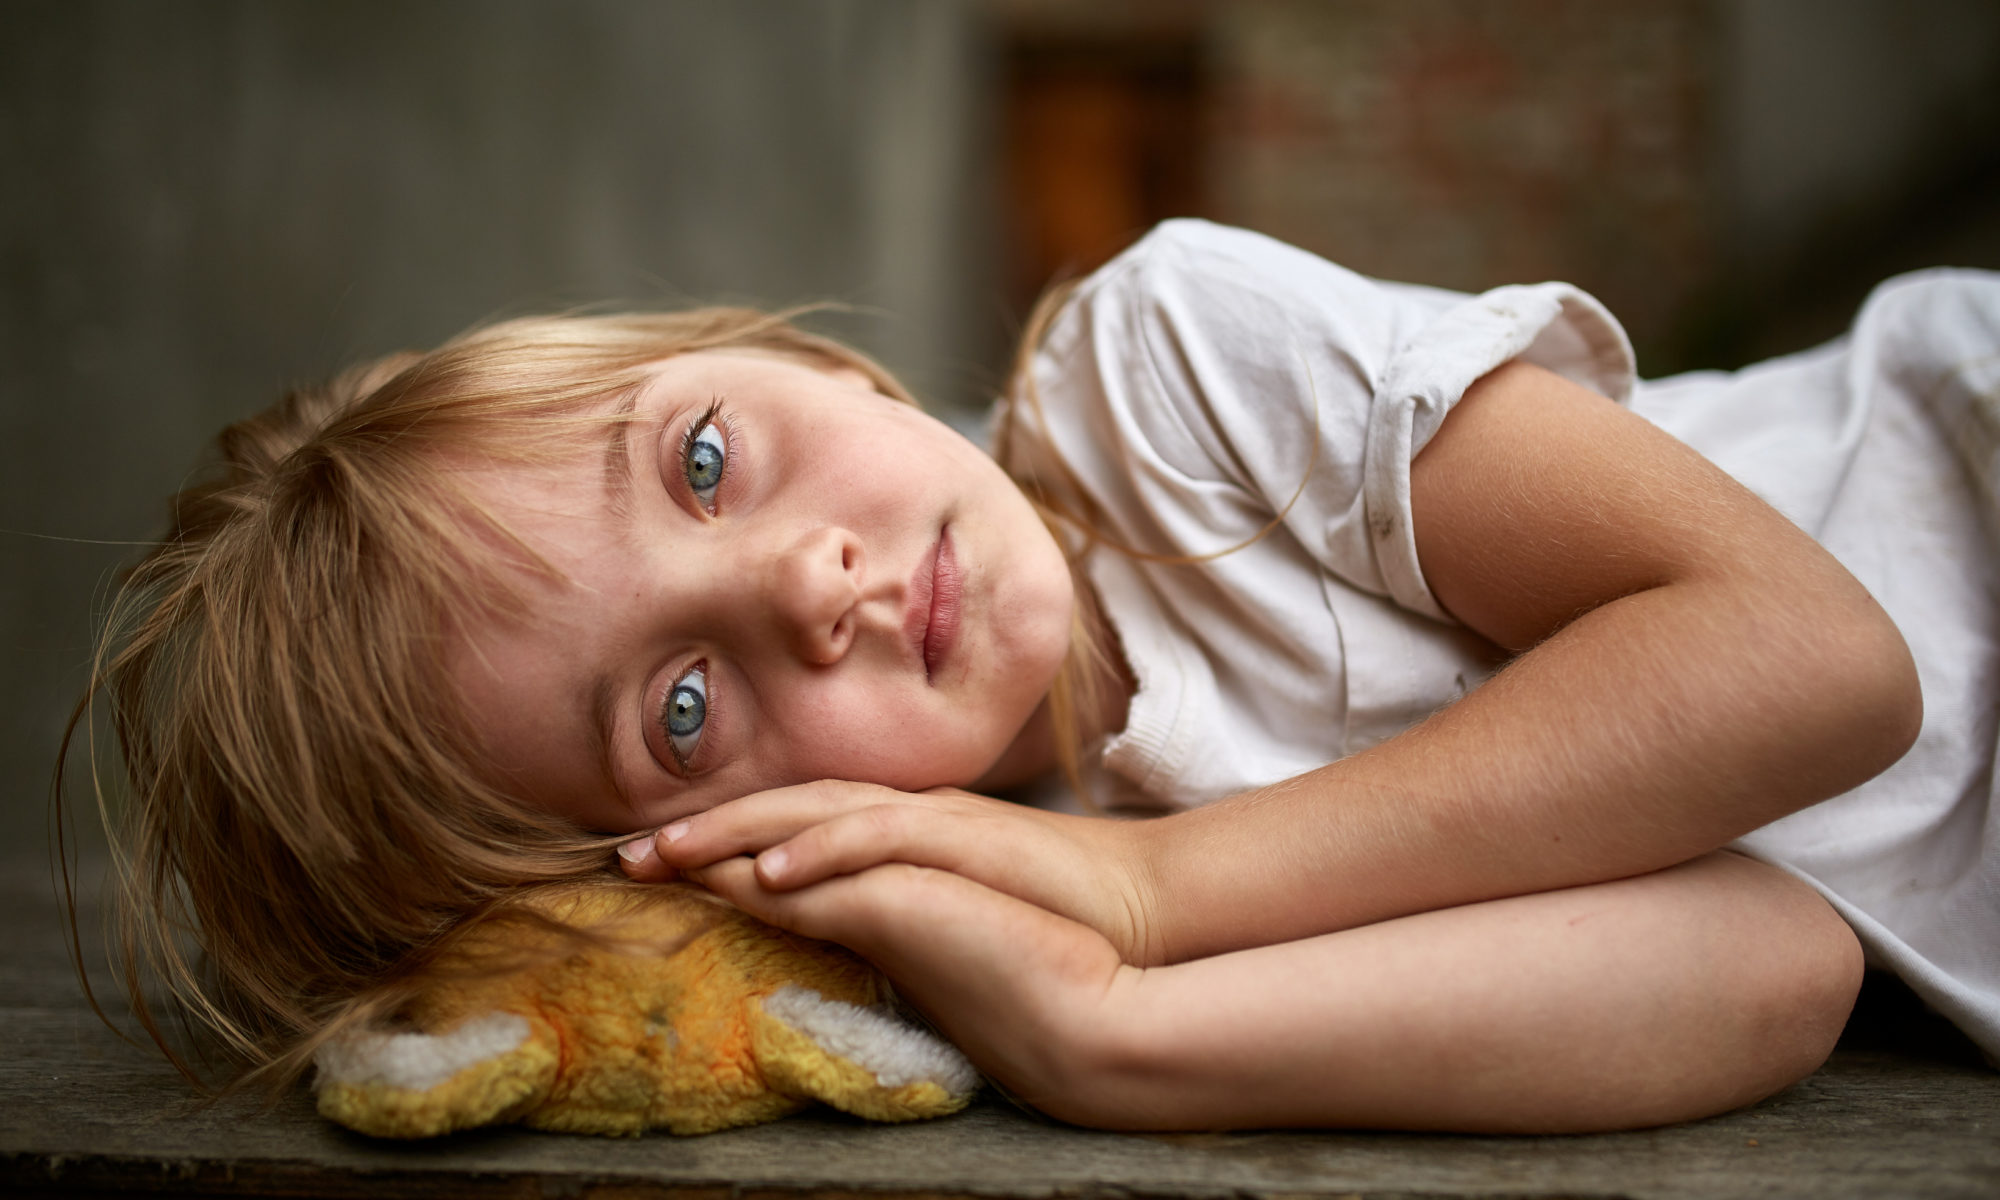 AdobeStock 213771868 2000x1200 - Hartz IV: Armutsforscher fordert Maßnahmen gegen Kinderarmut